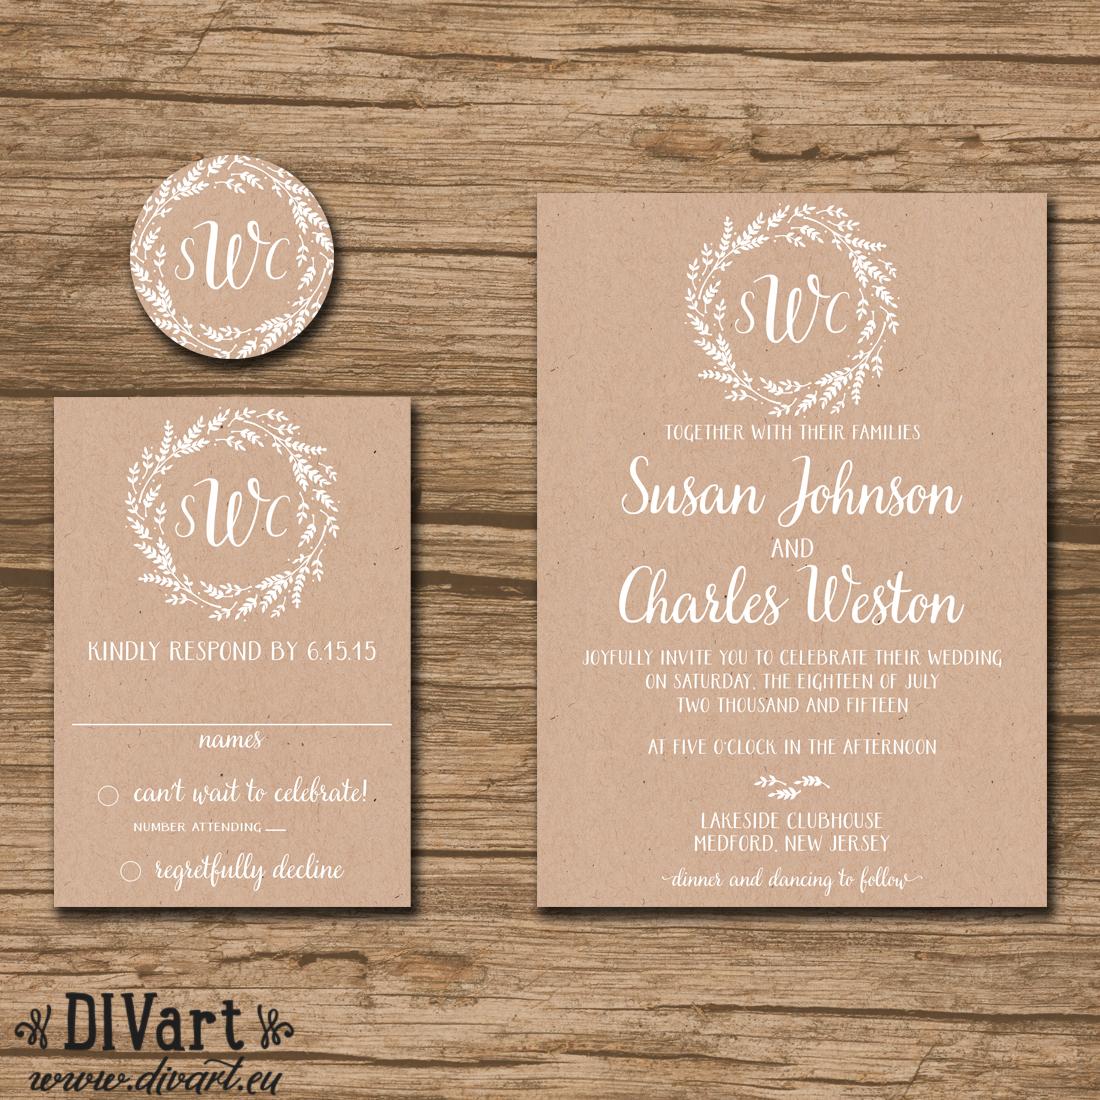 Wedding Invitations On Kraft Paper Rustic Wedding Invitation Suite Response Card Monogram Whimsical